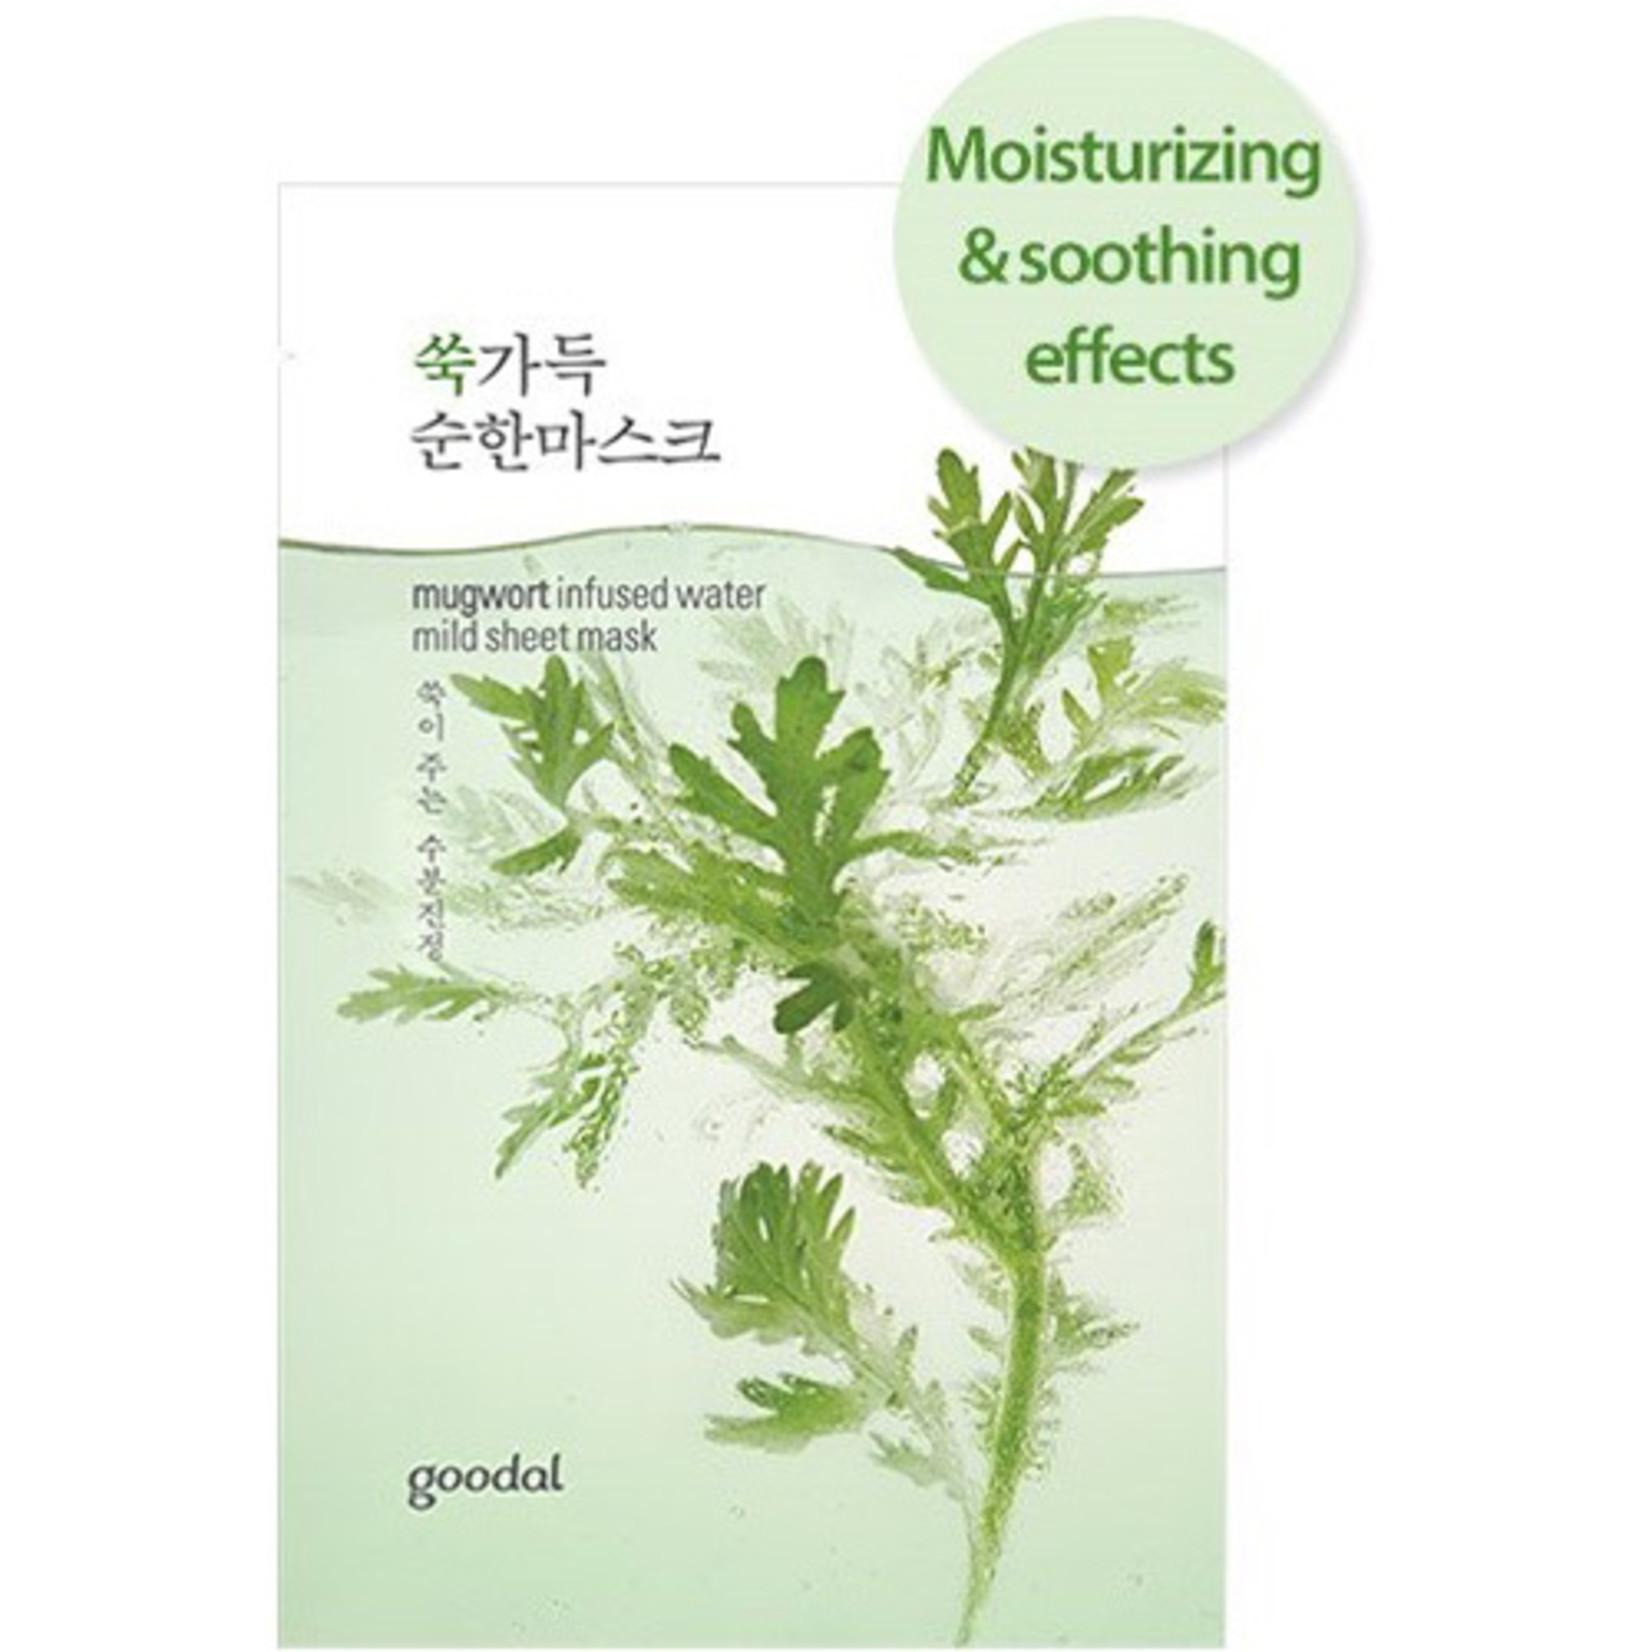 GOODAL mugwort infused water mild sheet mask